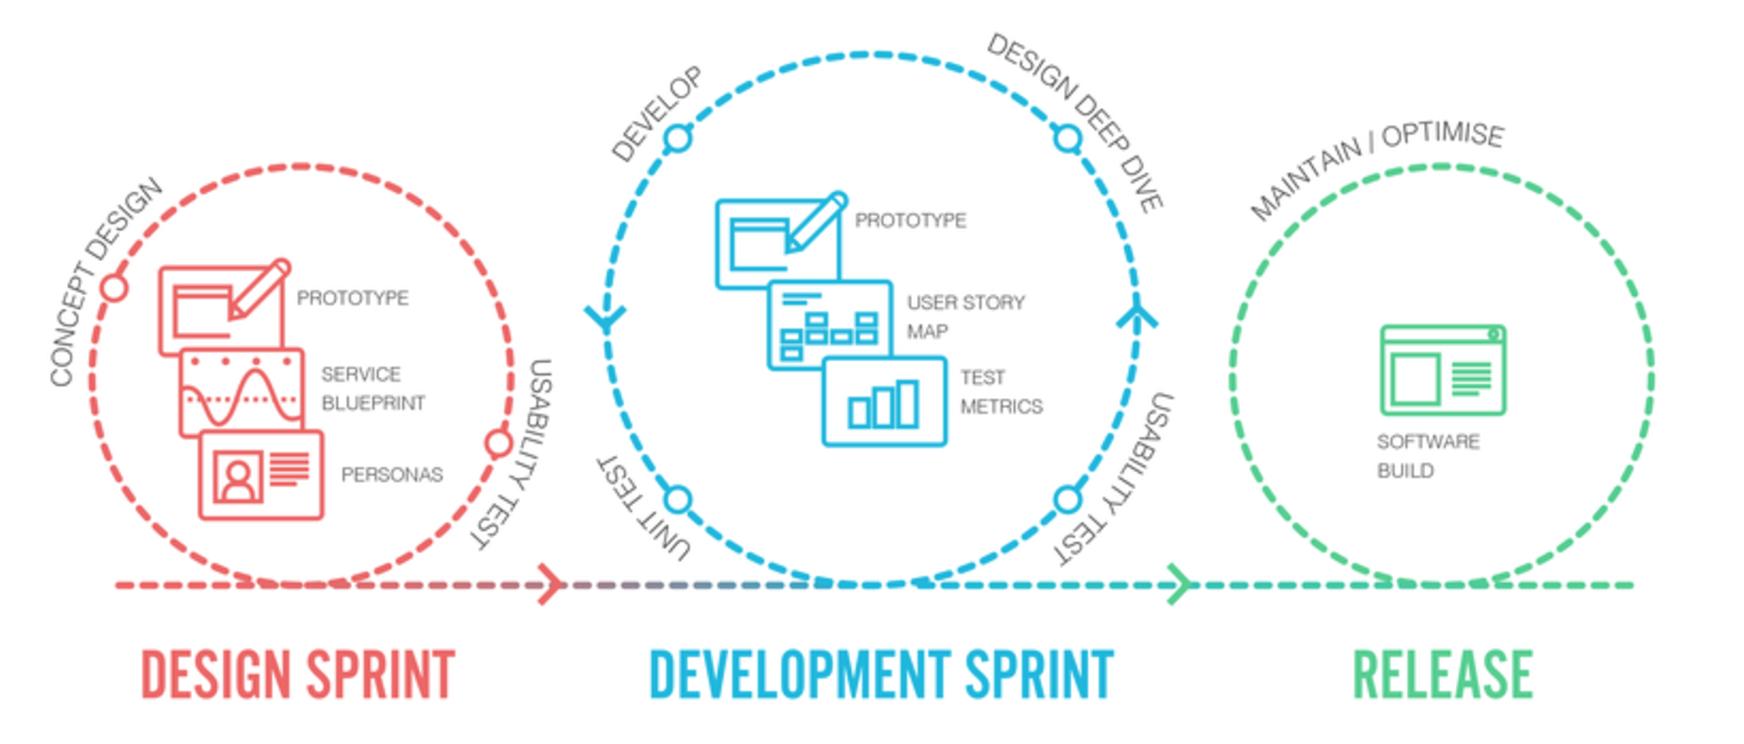 How to master lean design for agile development matt corrall establish a solid foundation malvernweather Image collections